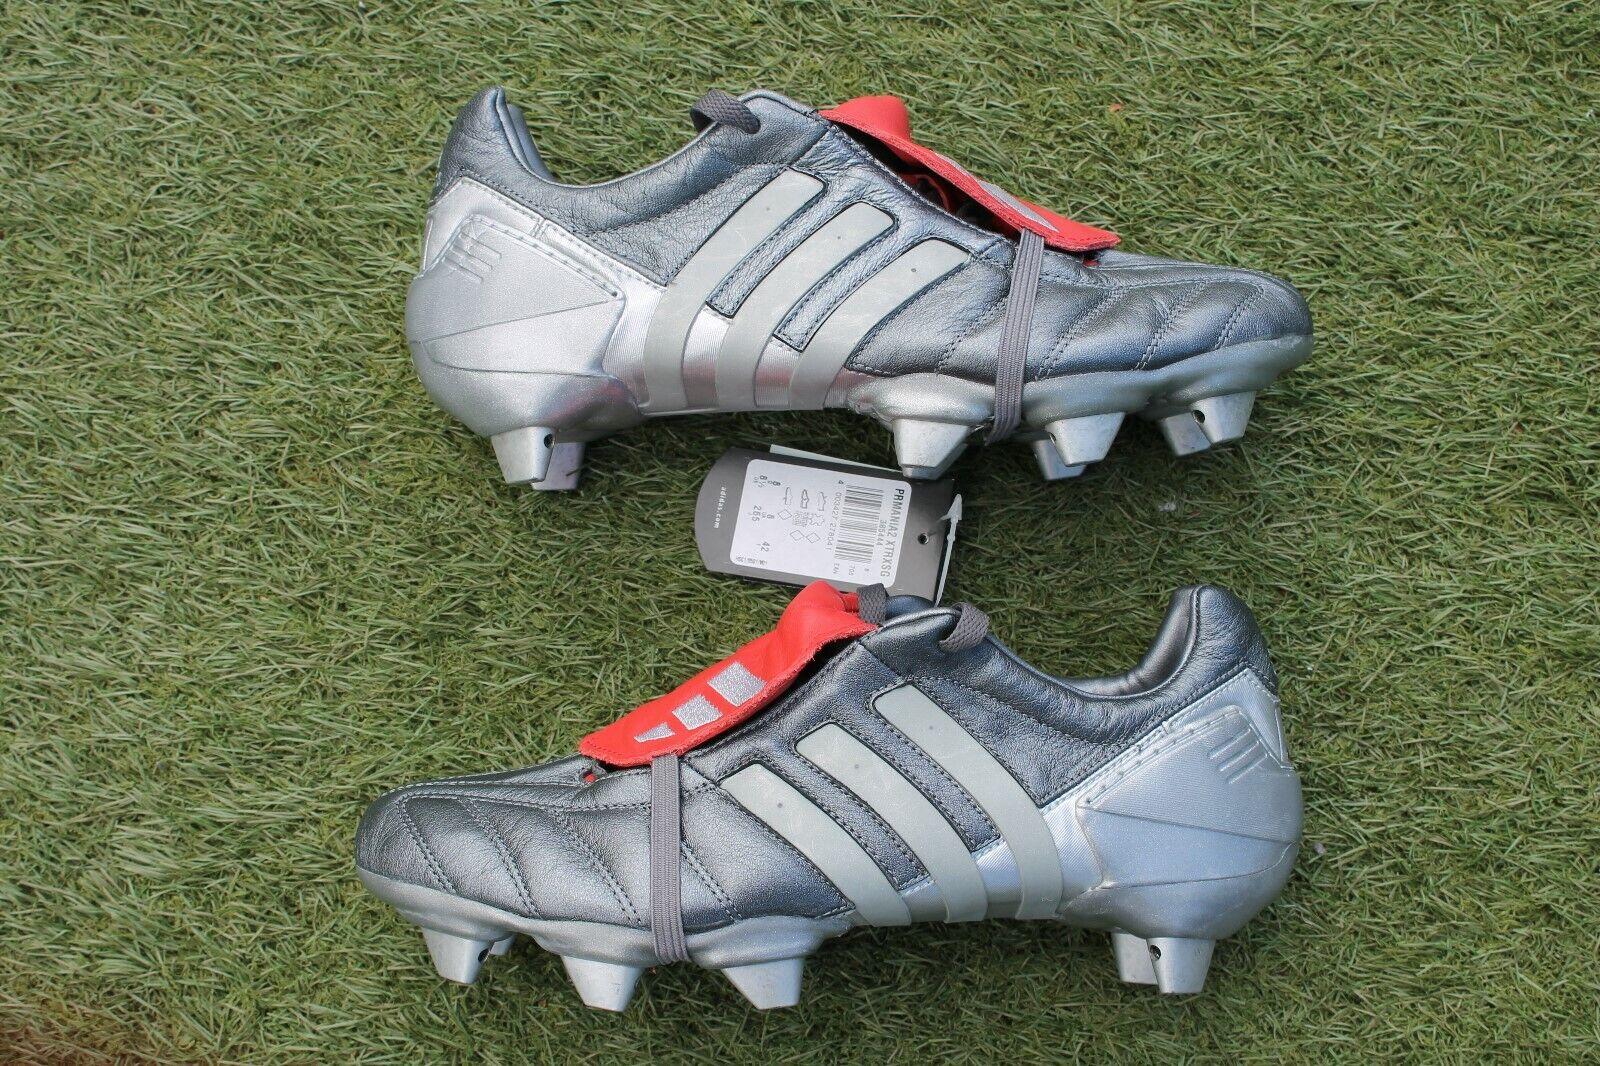 2002 BNWT Adidas Projoator Mania terreno blando Gun Metal UK Talla 8 botas de fútbol